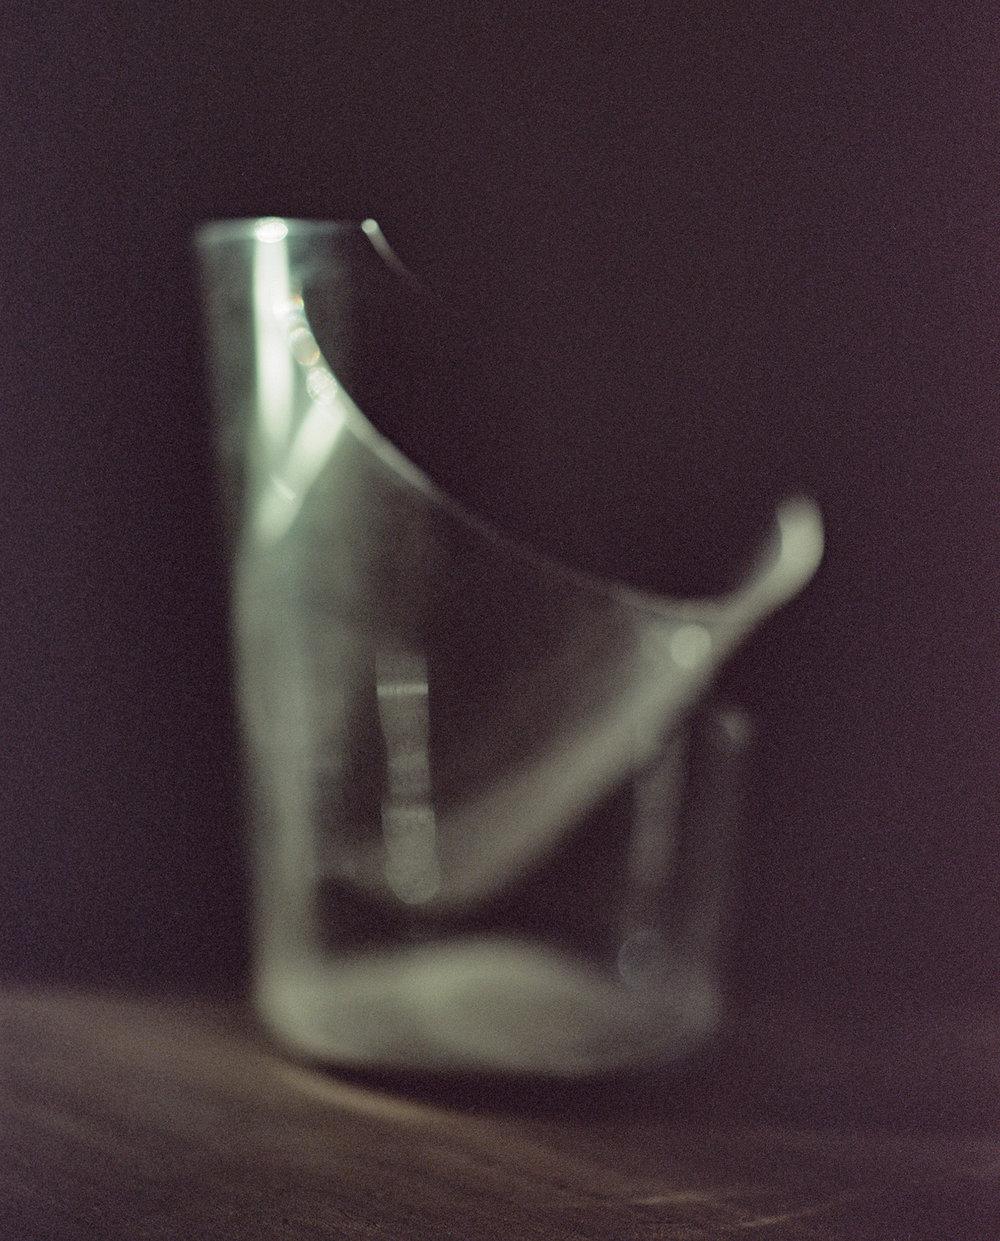 Broken Glass #62